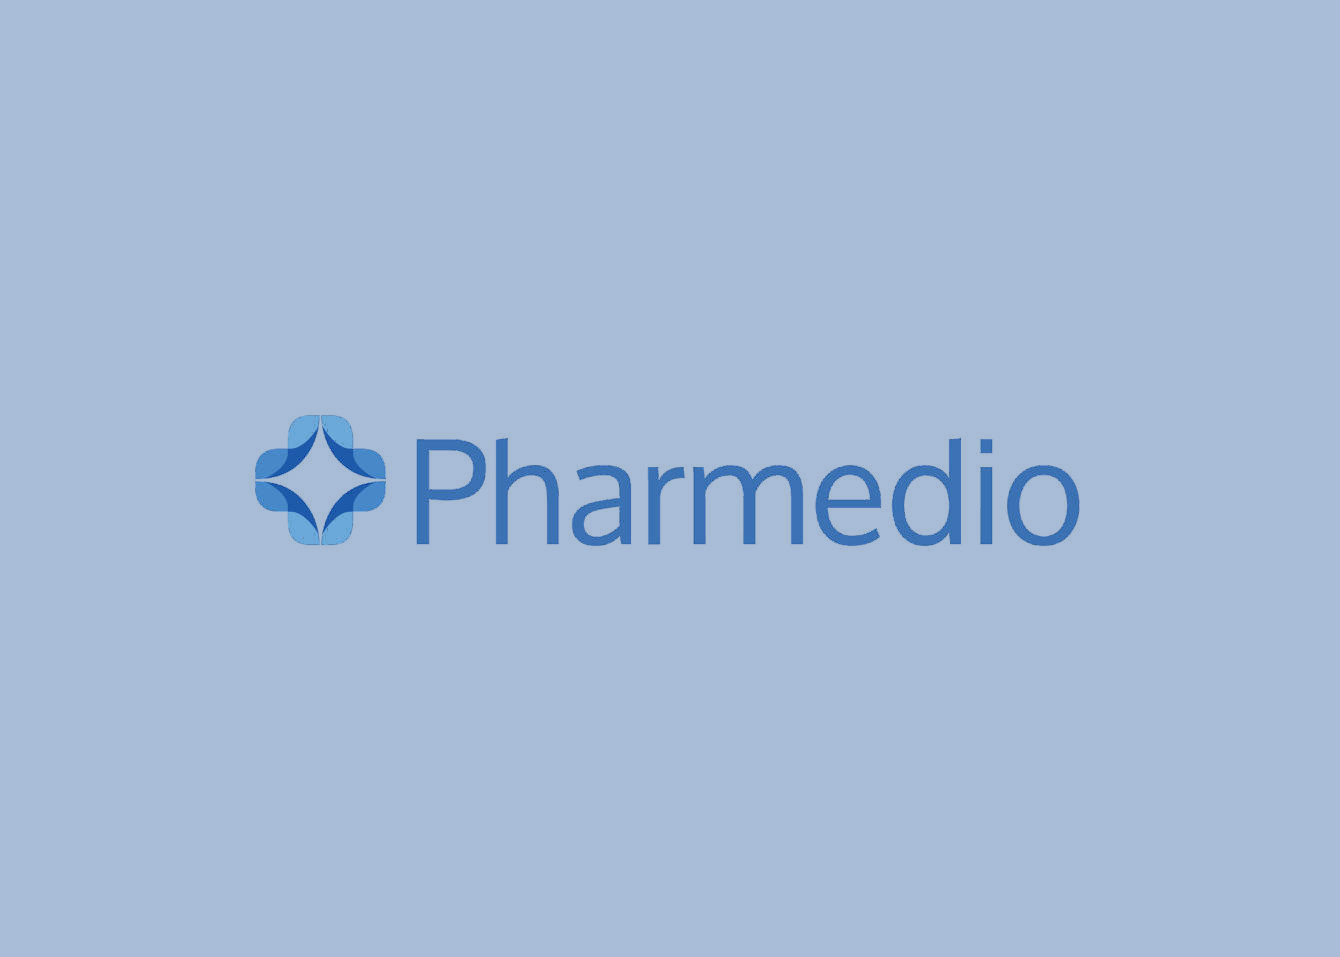 Pharmedio Logo Design